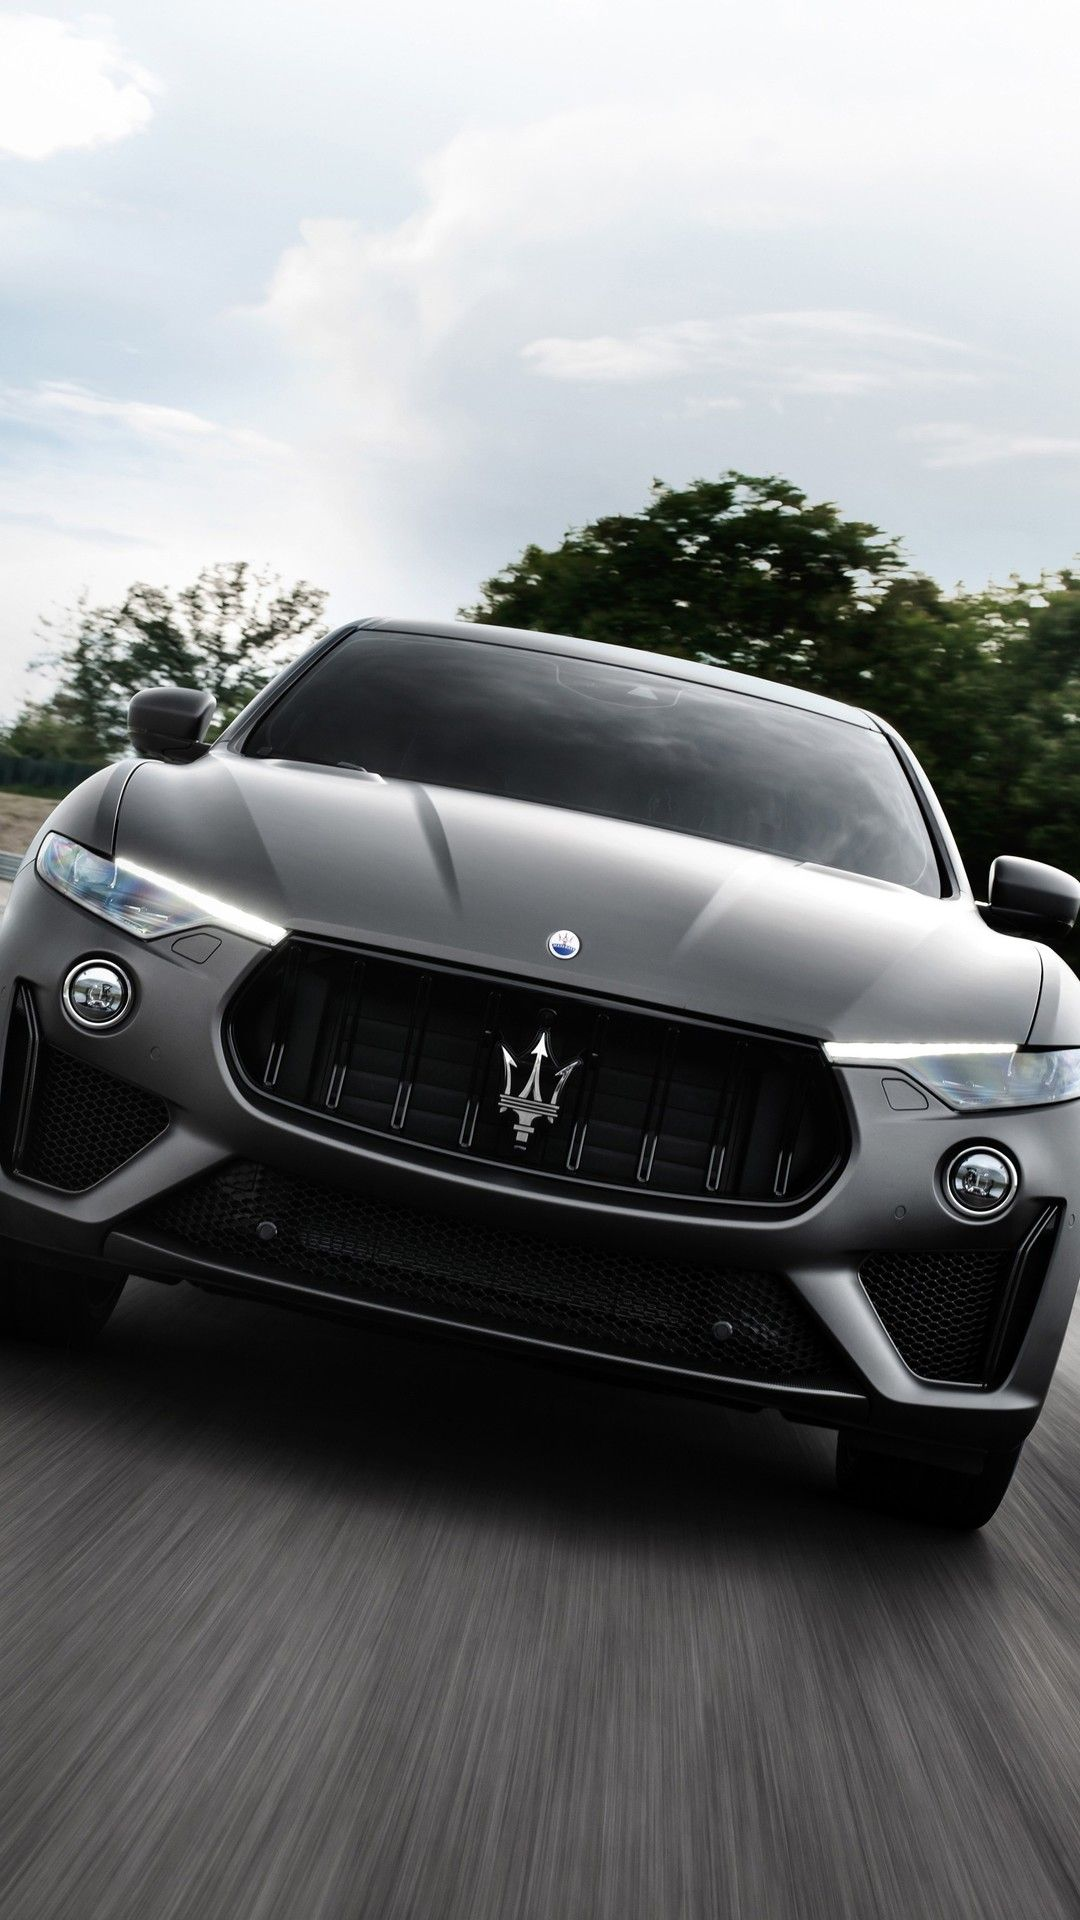 2018 Maserati Levante Trofeo Bespoke Cars Luxury Car Brands Maserati Suv